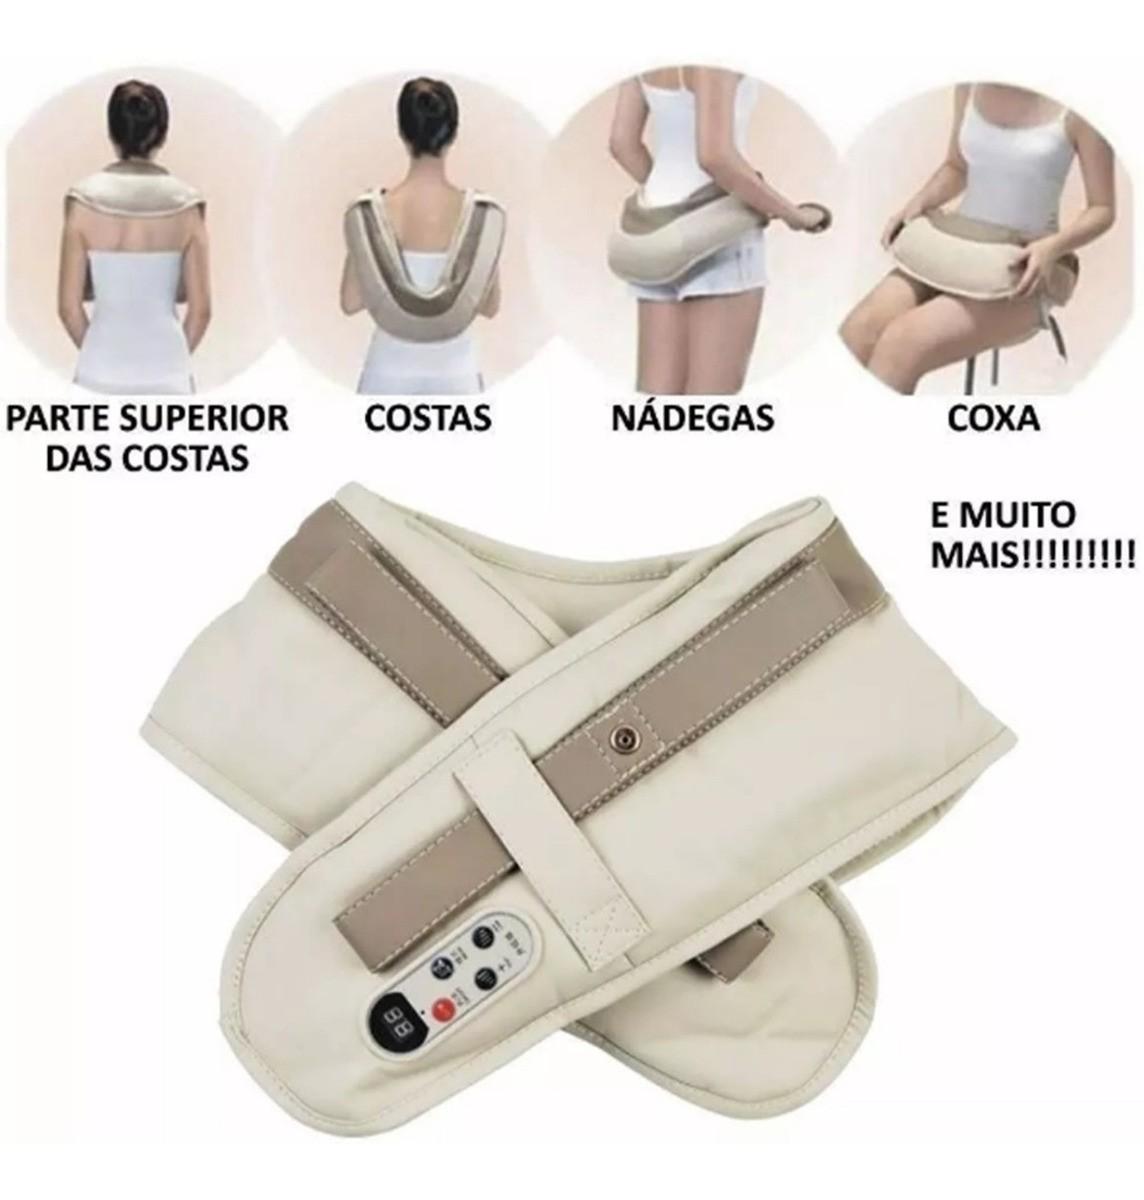 Massageador Cervical Elétrico Ombros Lombar Colete Shiatsu